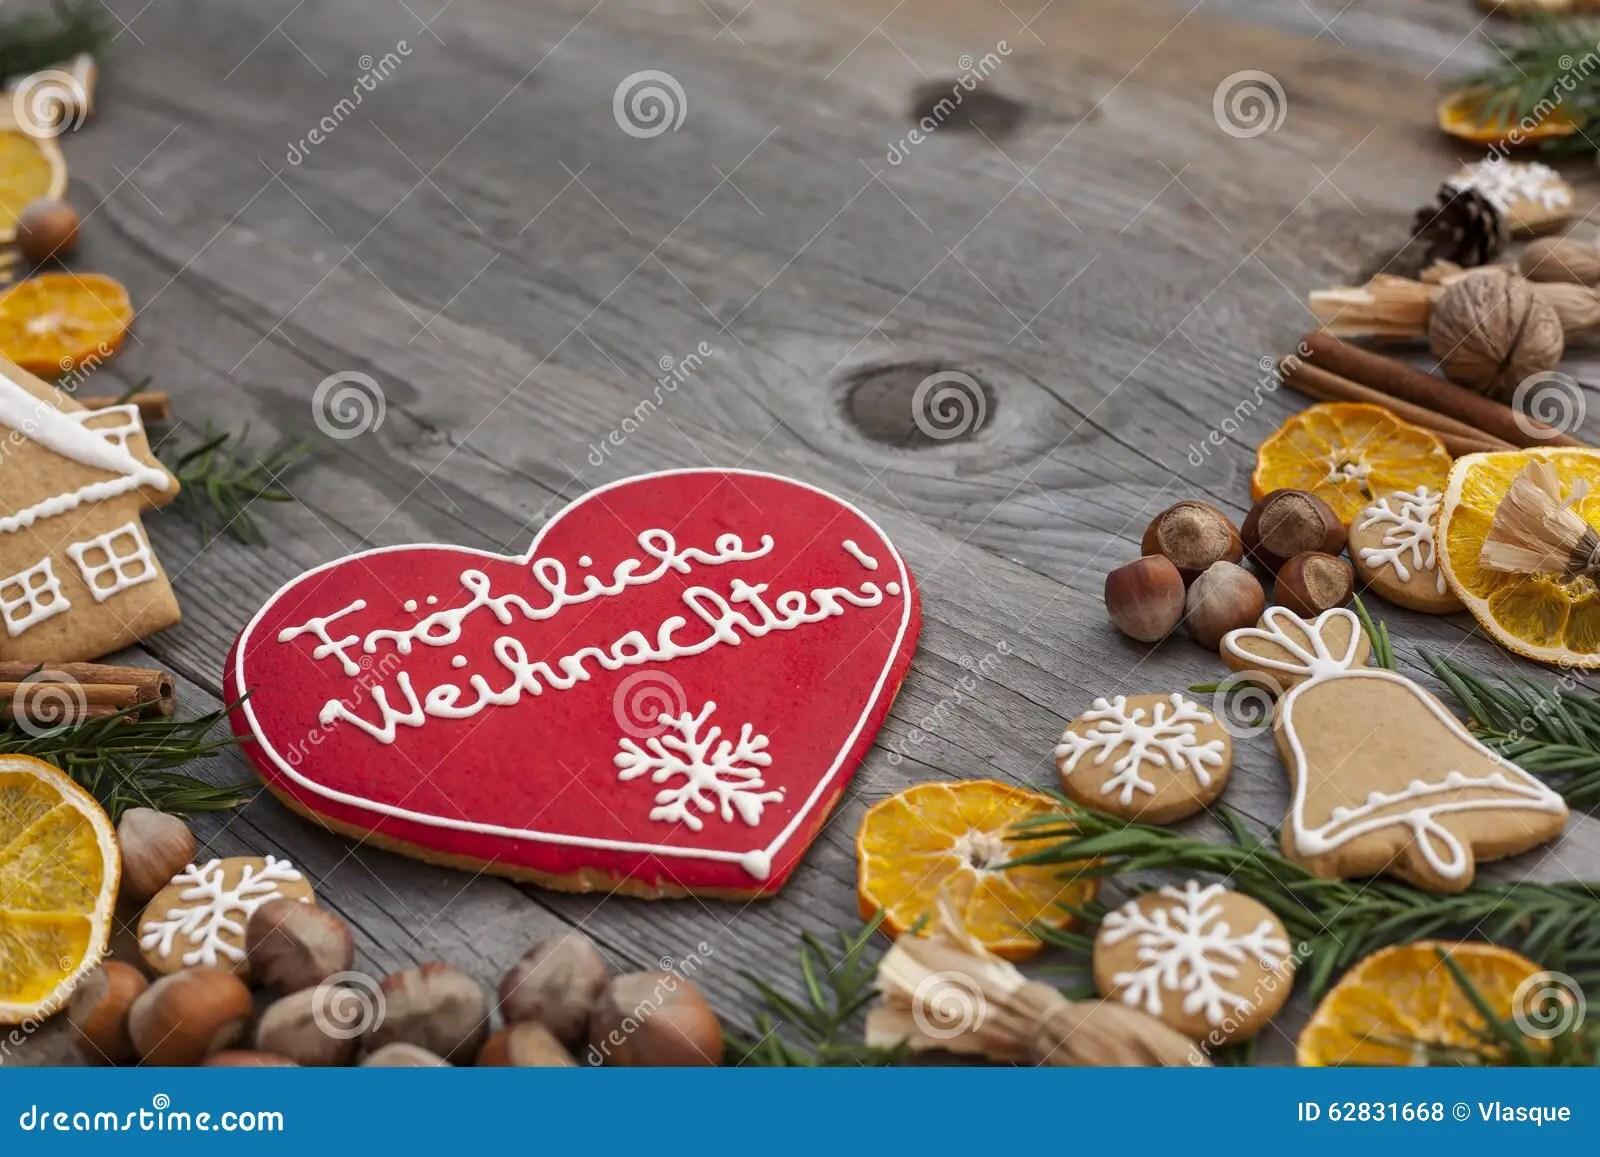 Christmas Cards Written In German